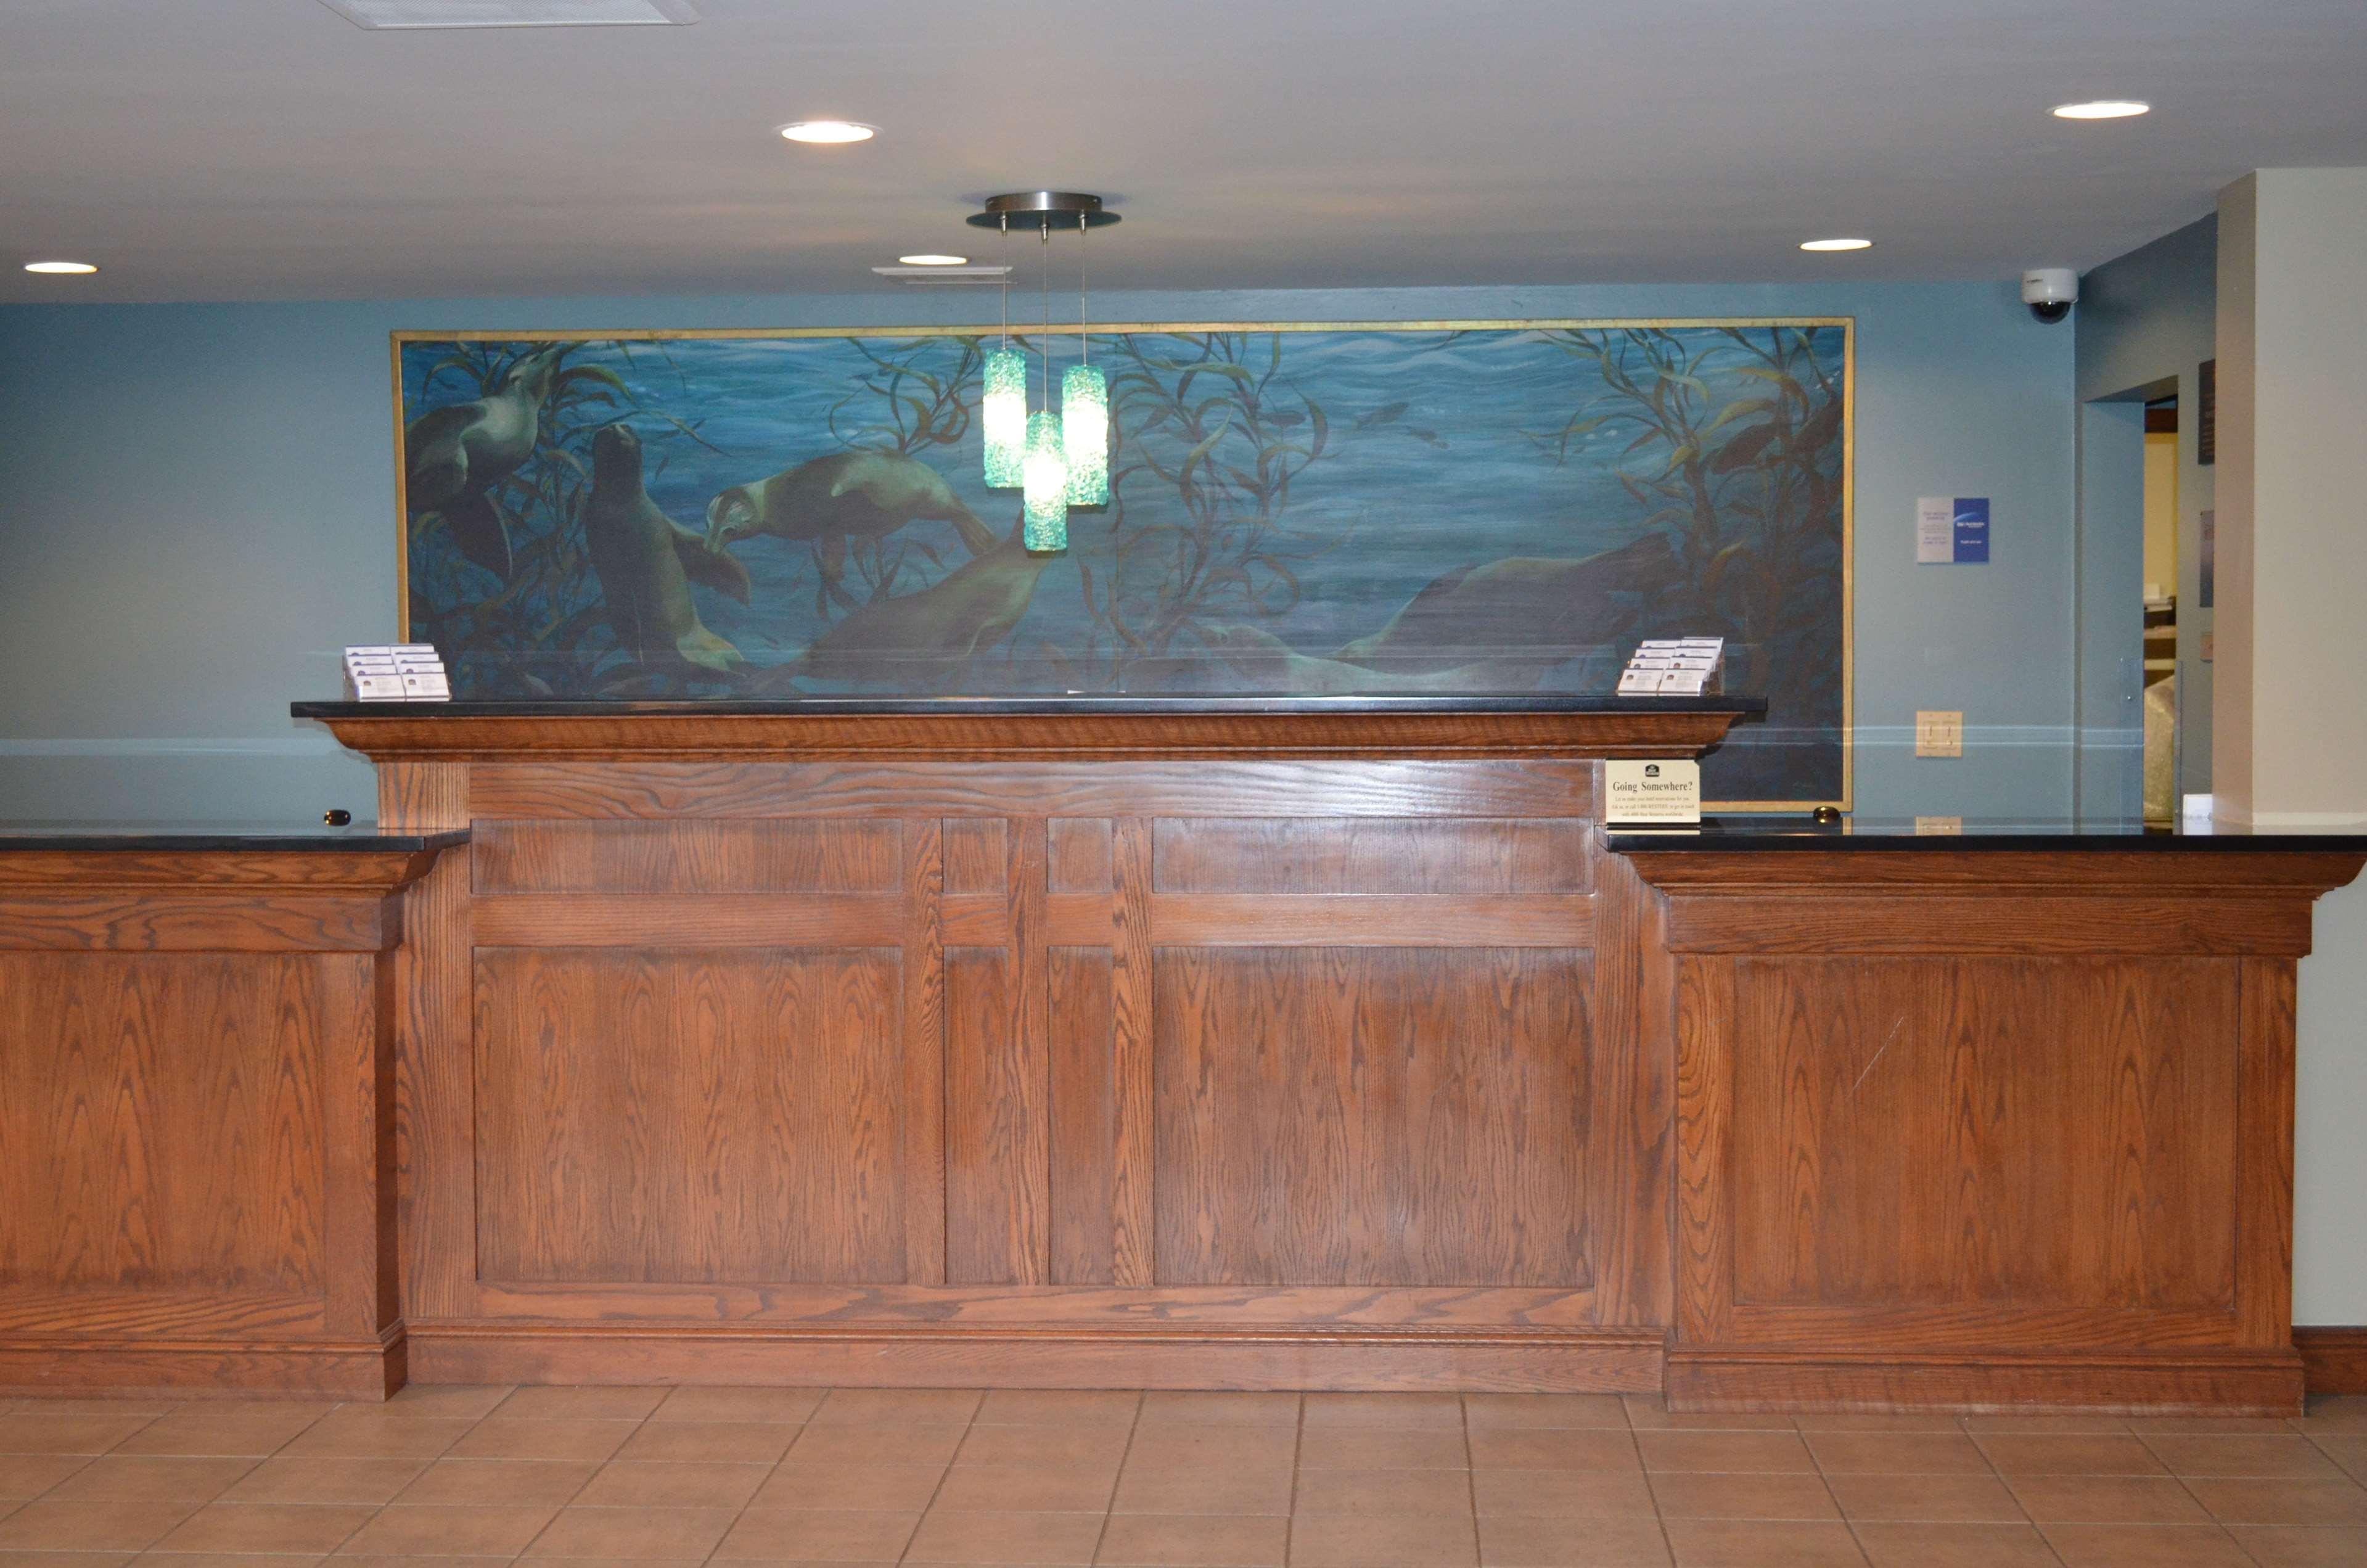 Best Western Agate Beach Inn image 13